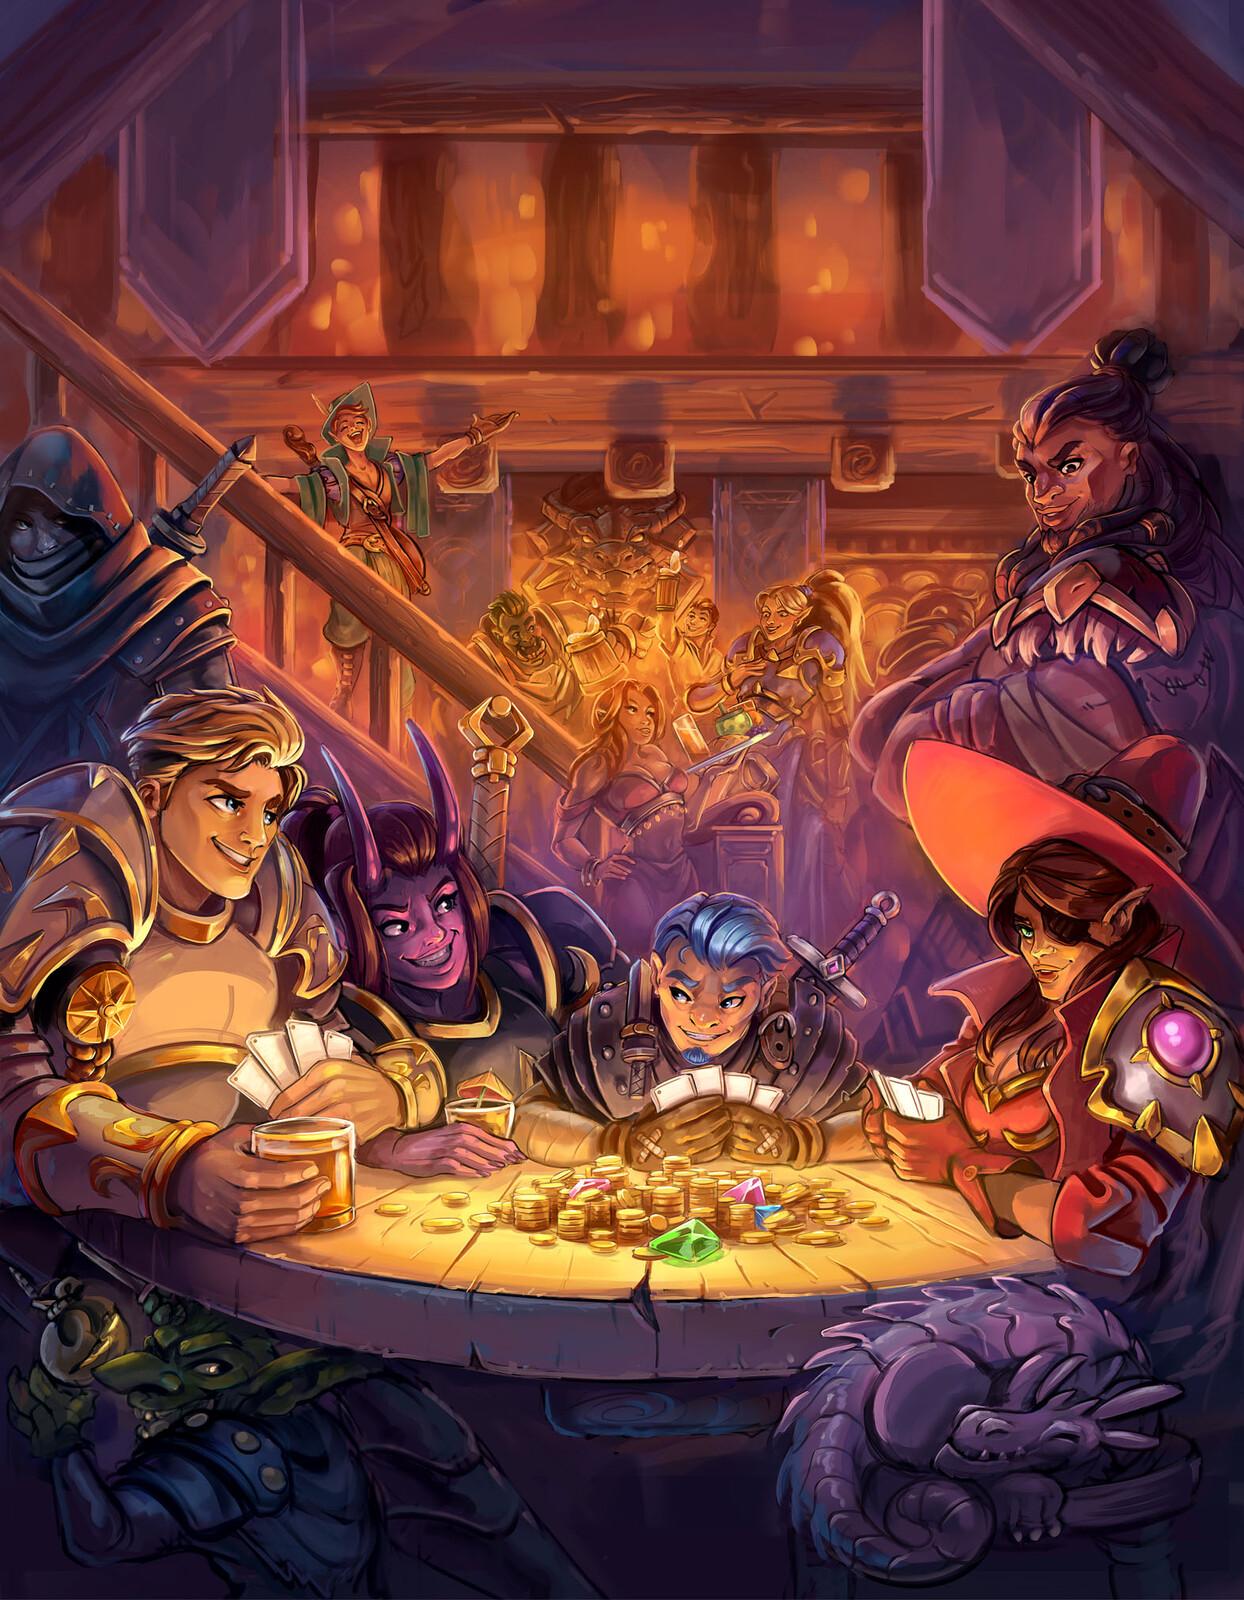 """...You start in a tavern"""